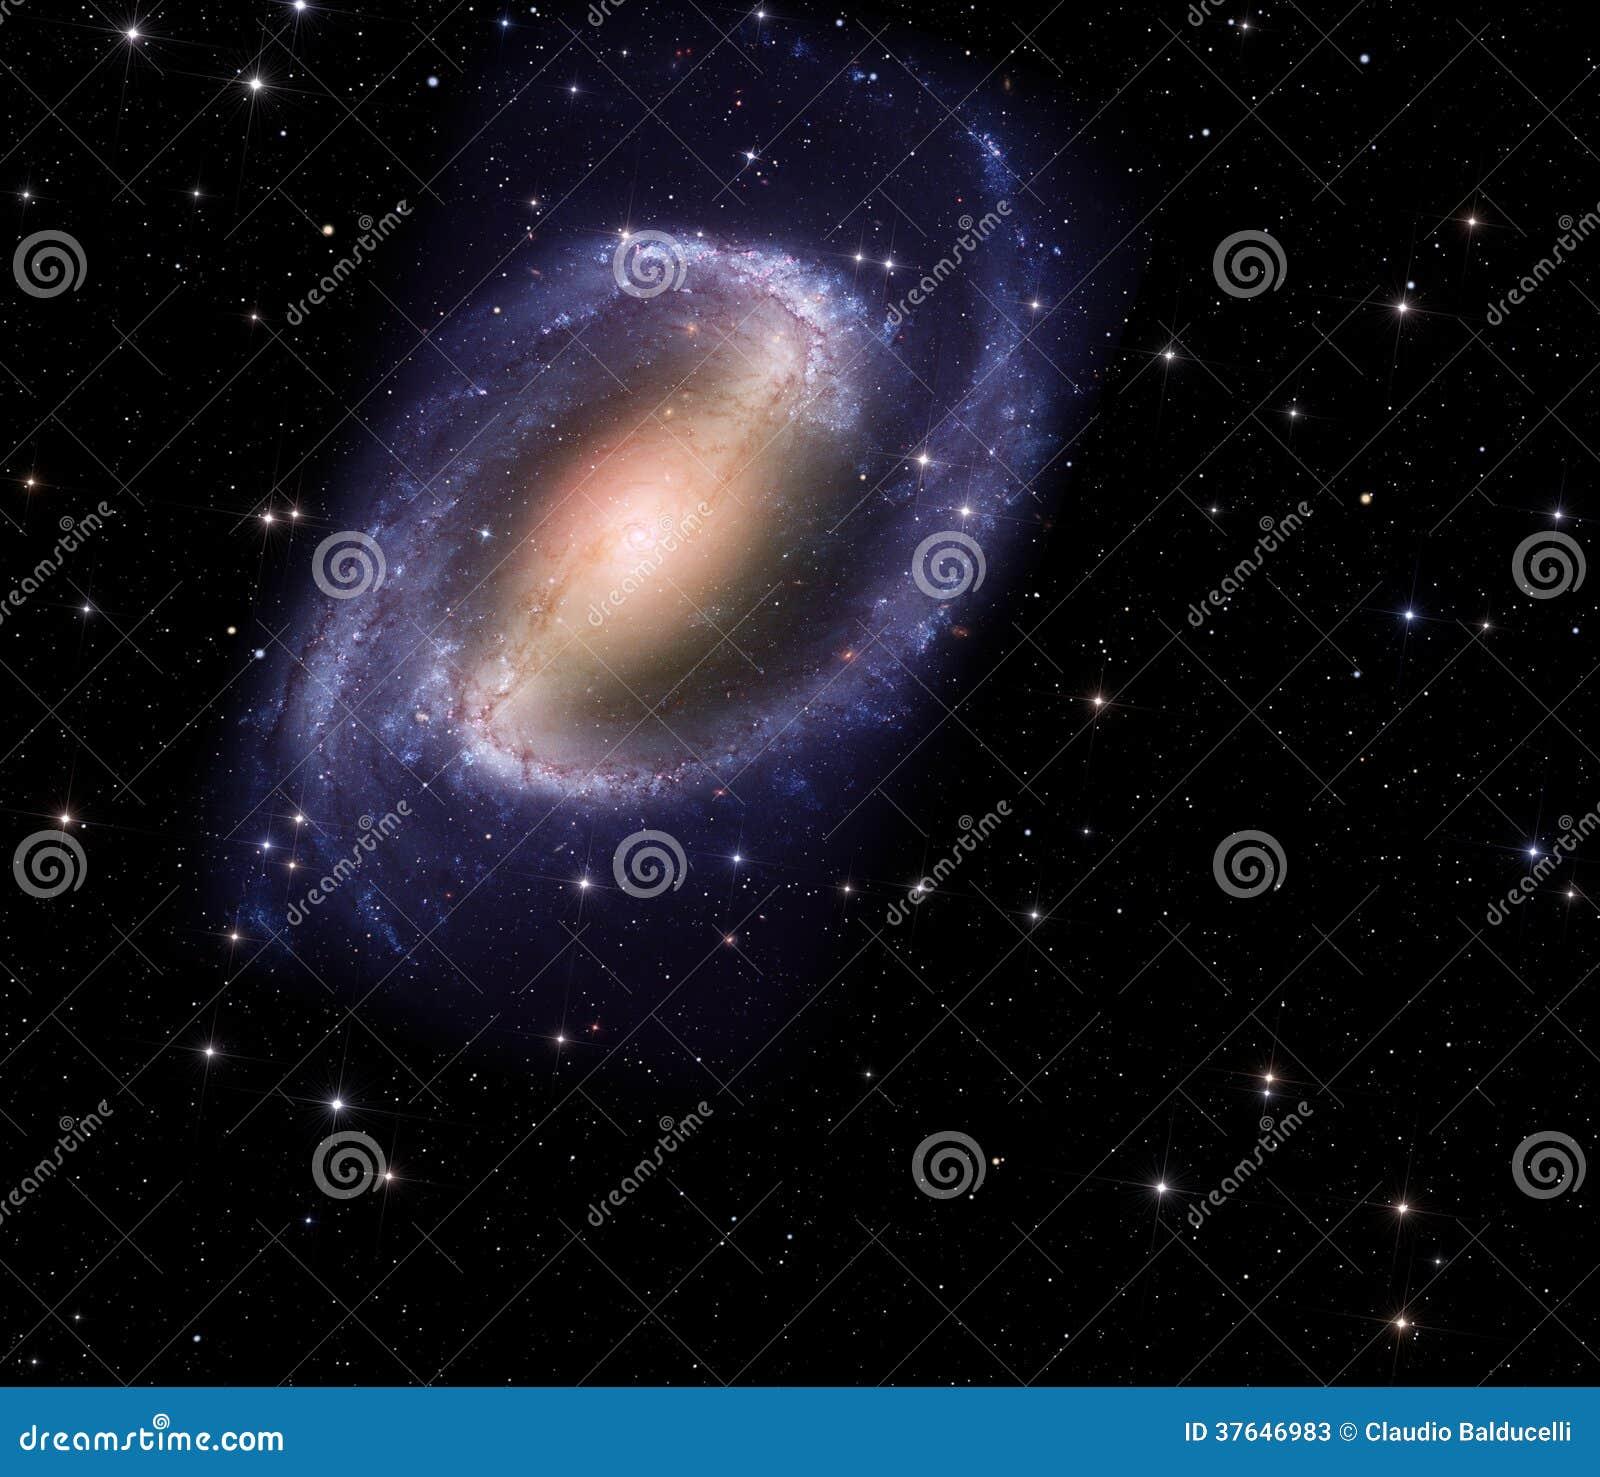 Spiral galaxy in deep space